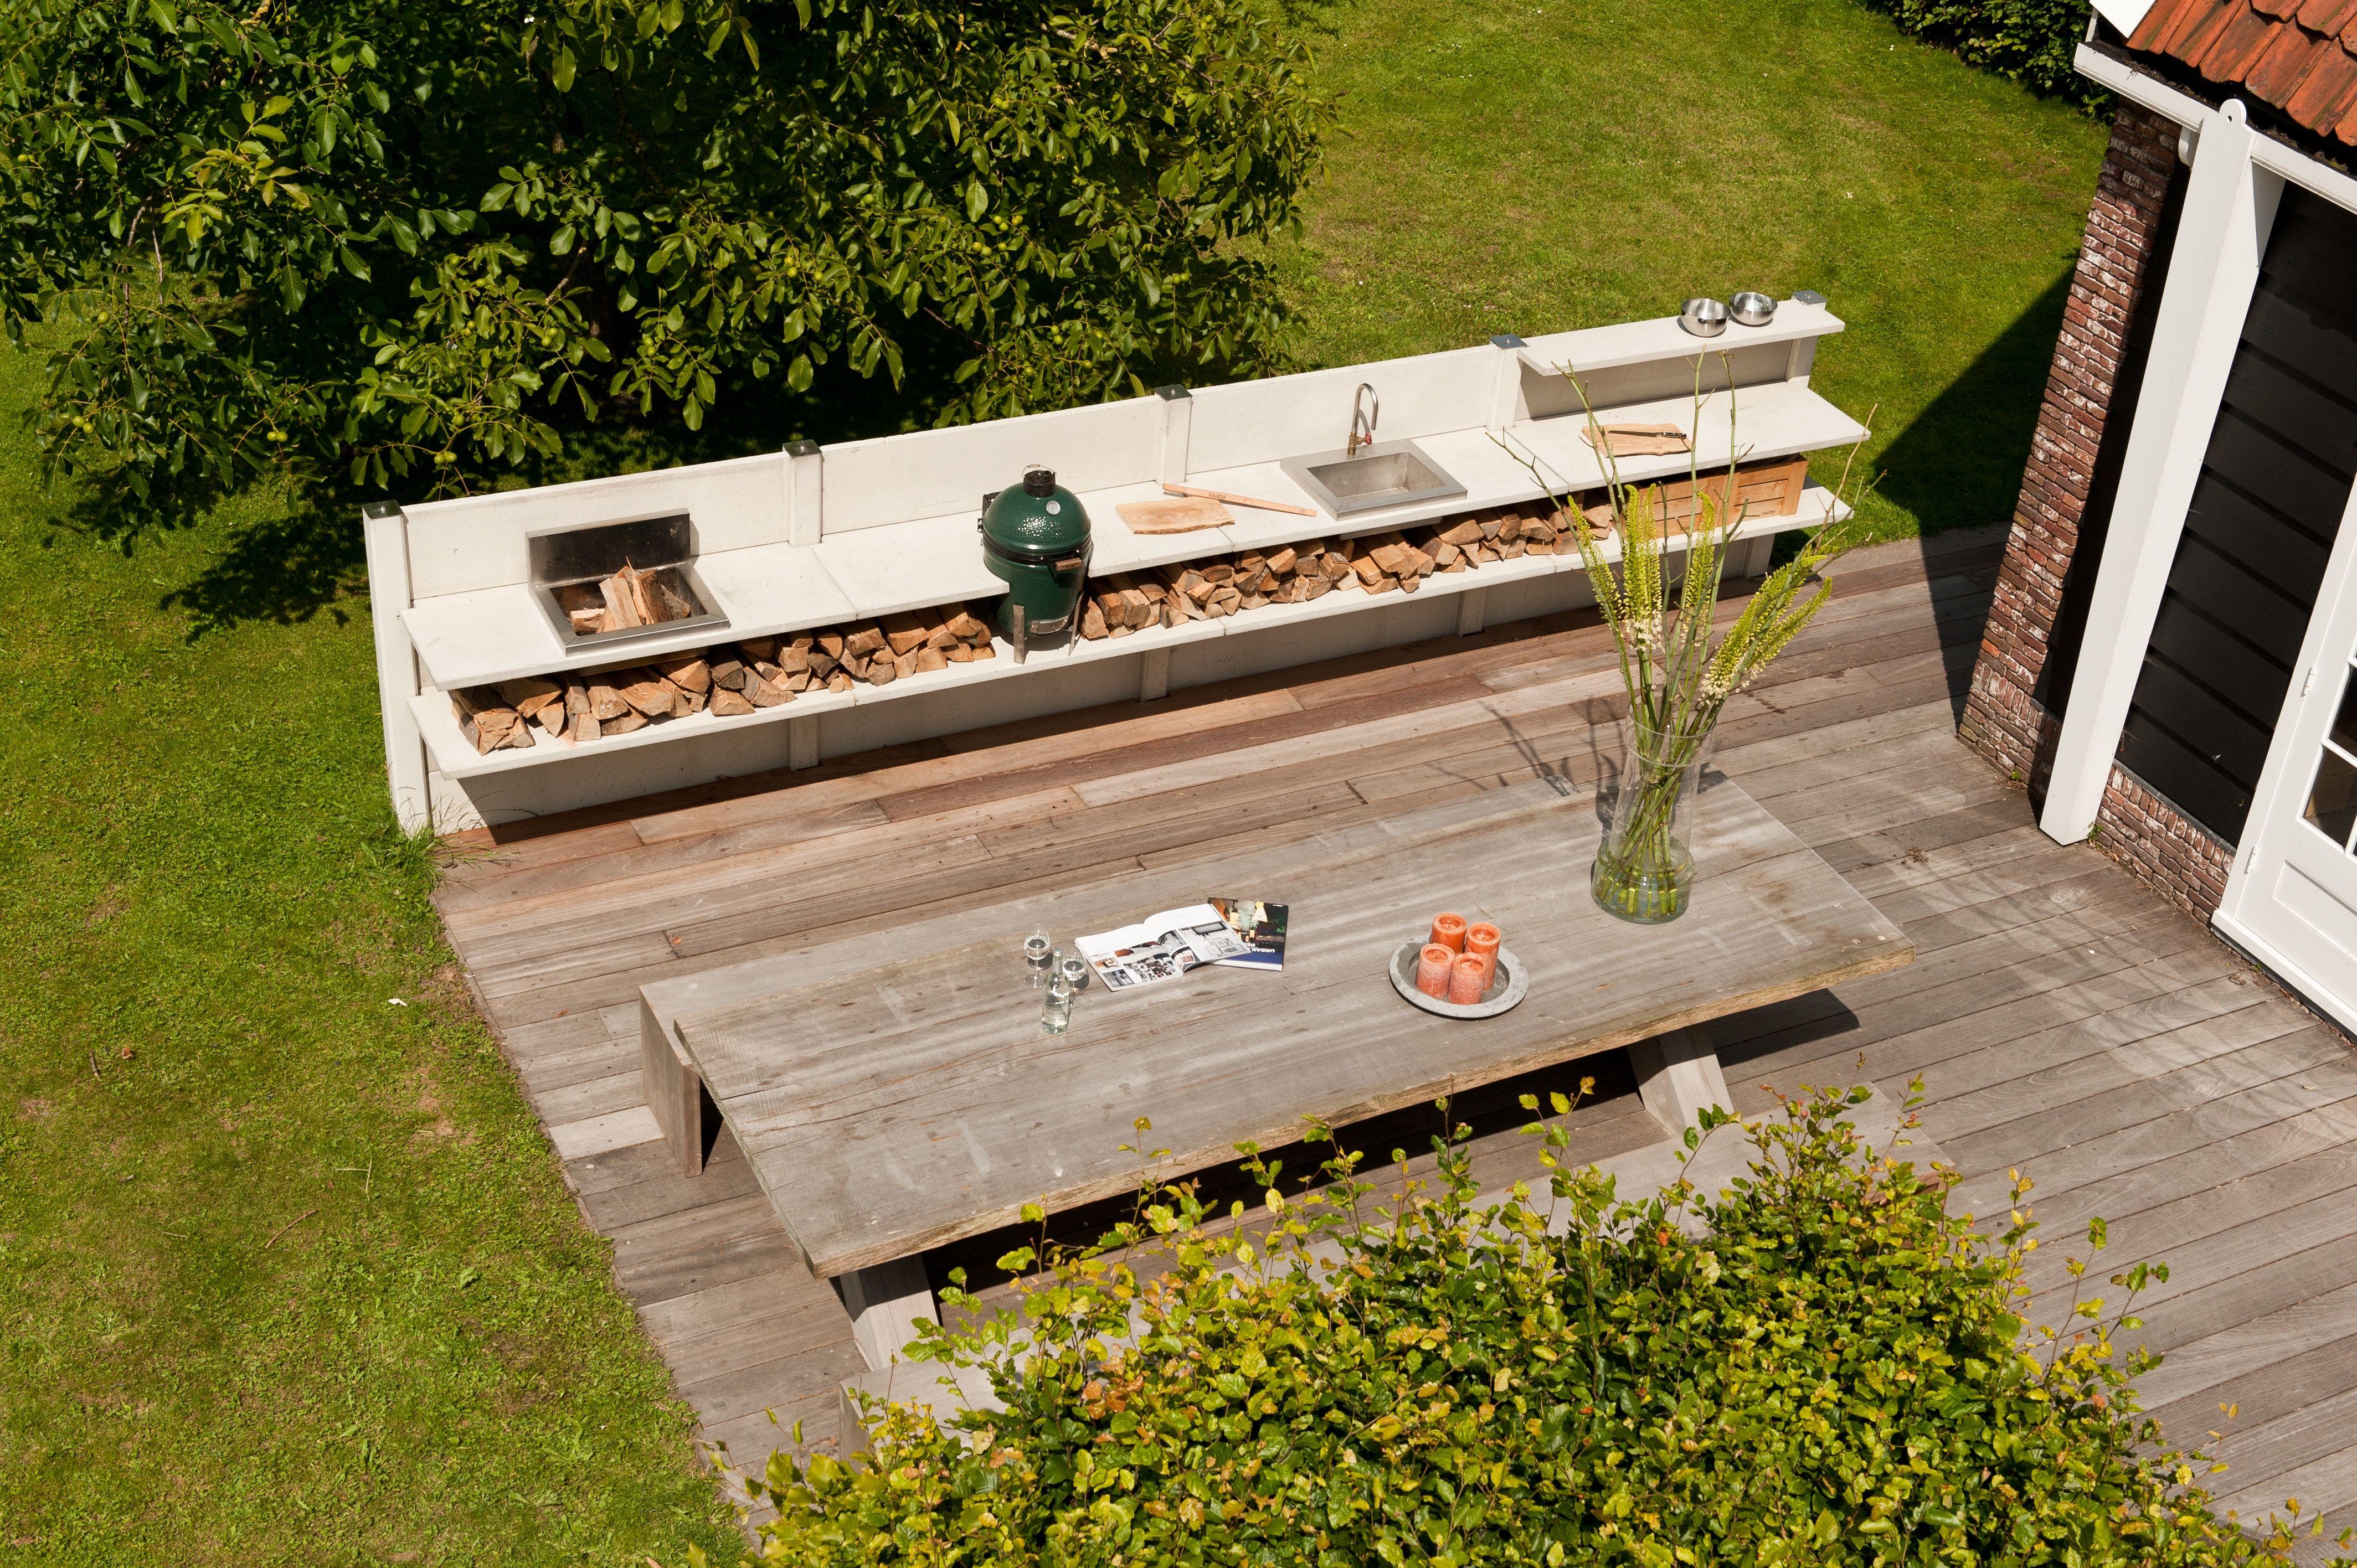 Base Camp Buitenkeuken.Wwoo Outdoor Kitchen Outdoor Kitchen Modular Outdoor Kitchens